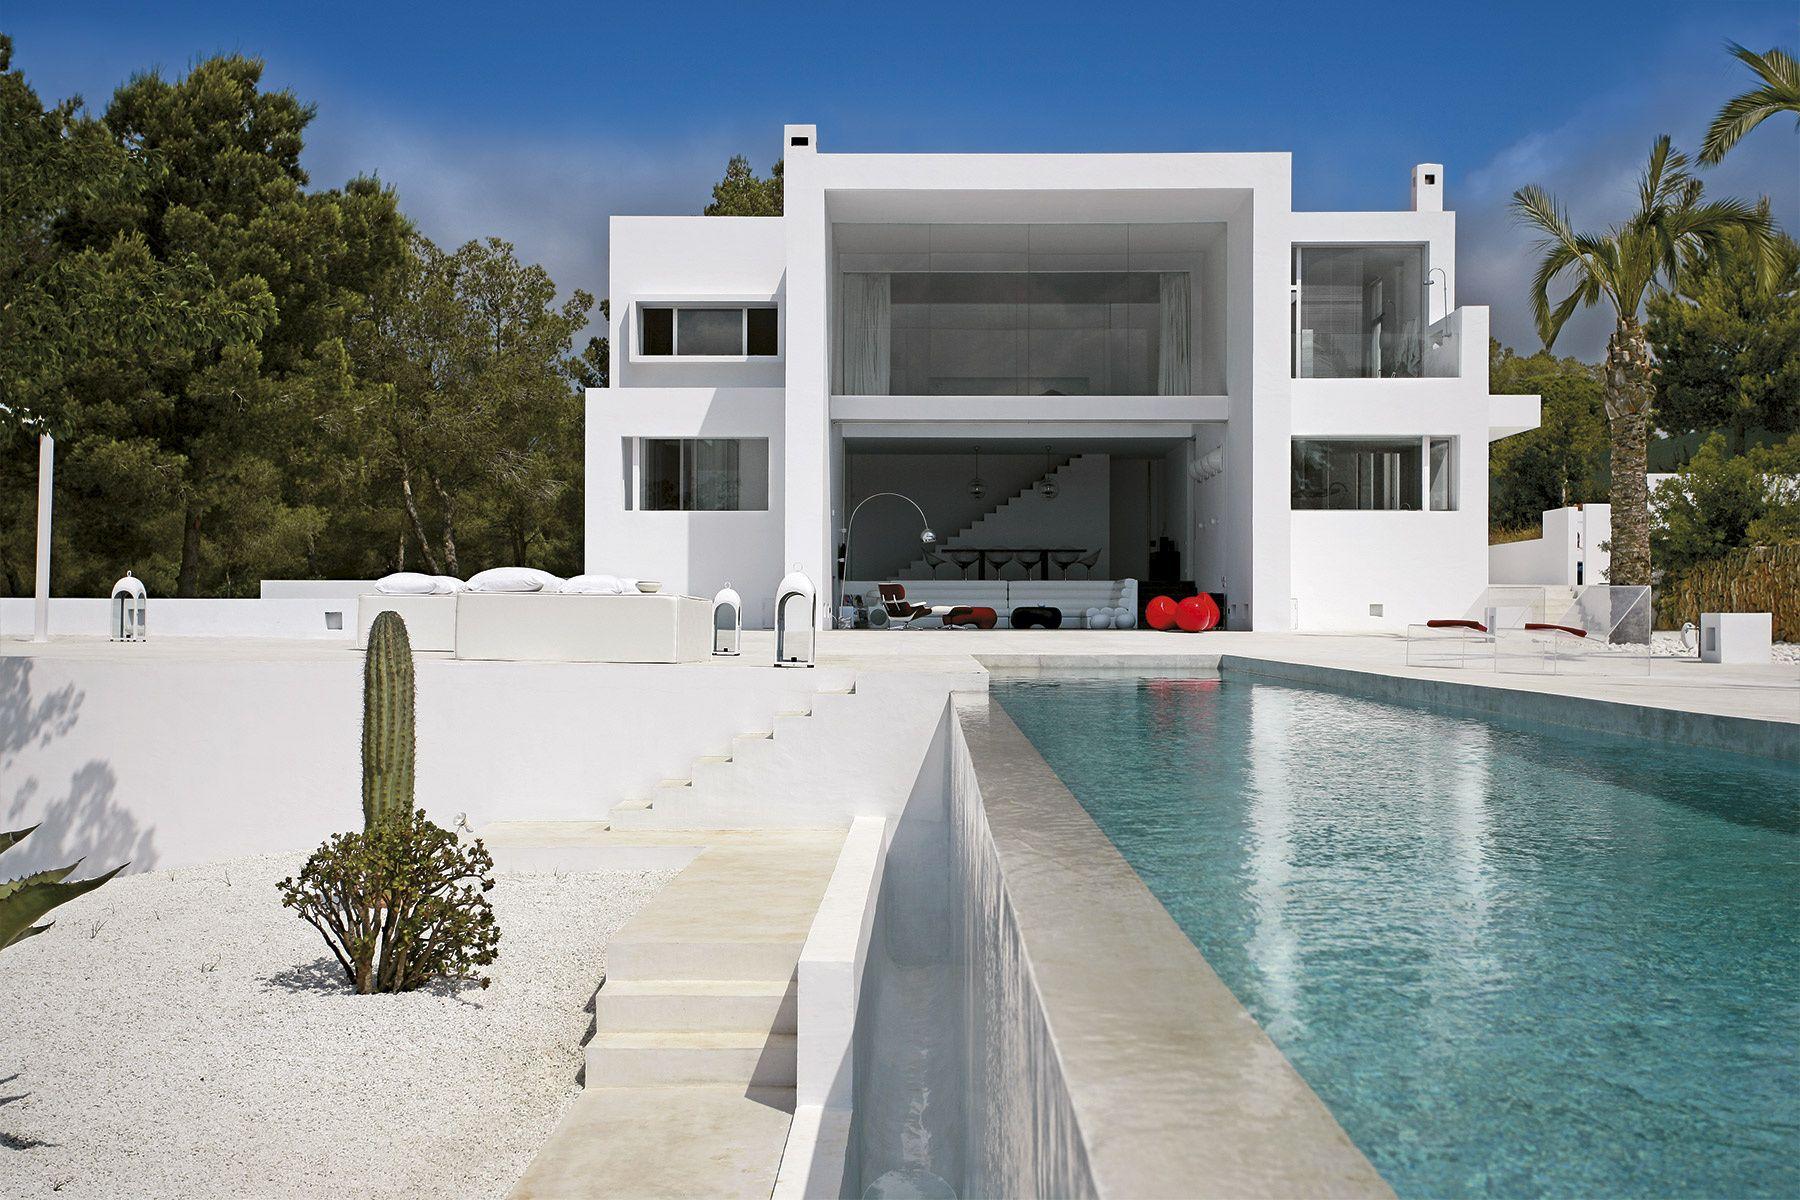 Casa de verano ad espa a marco severini la piscina for Piscinas hechas a medida